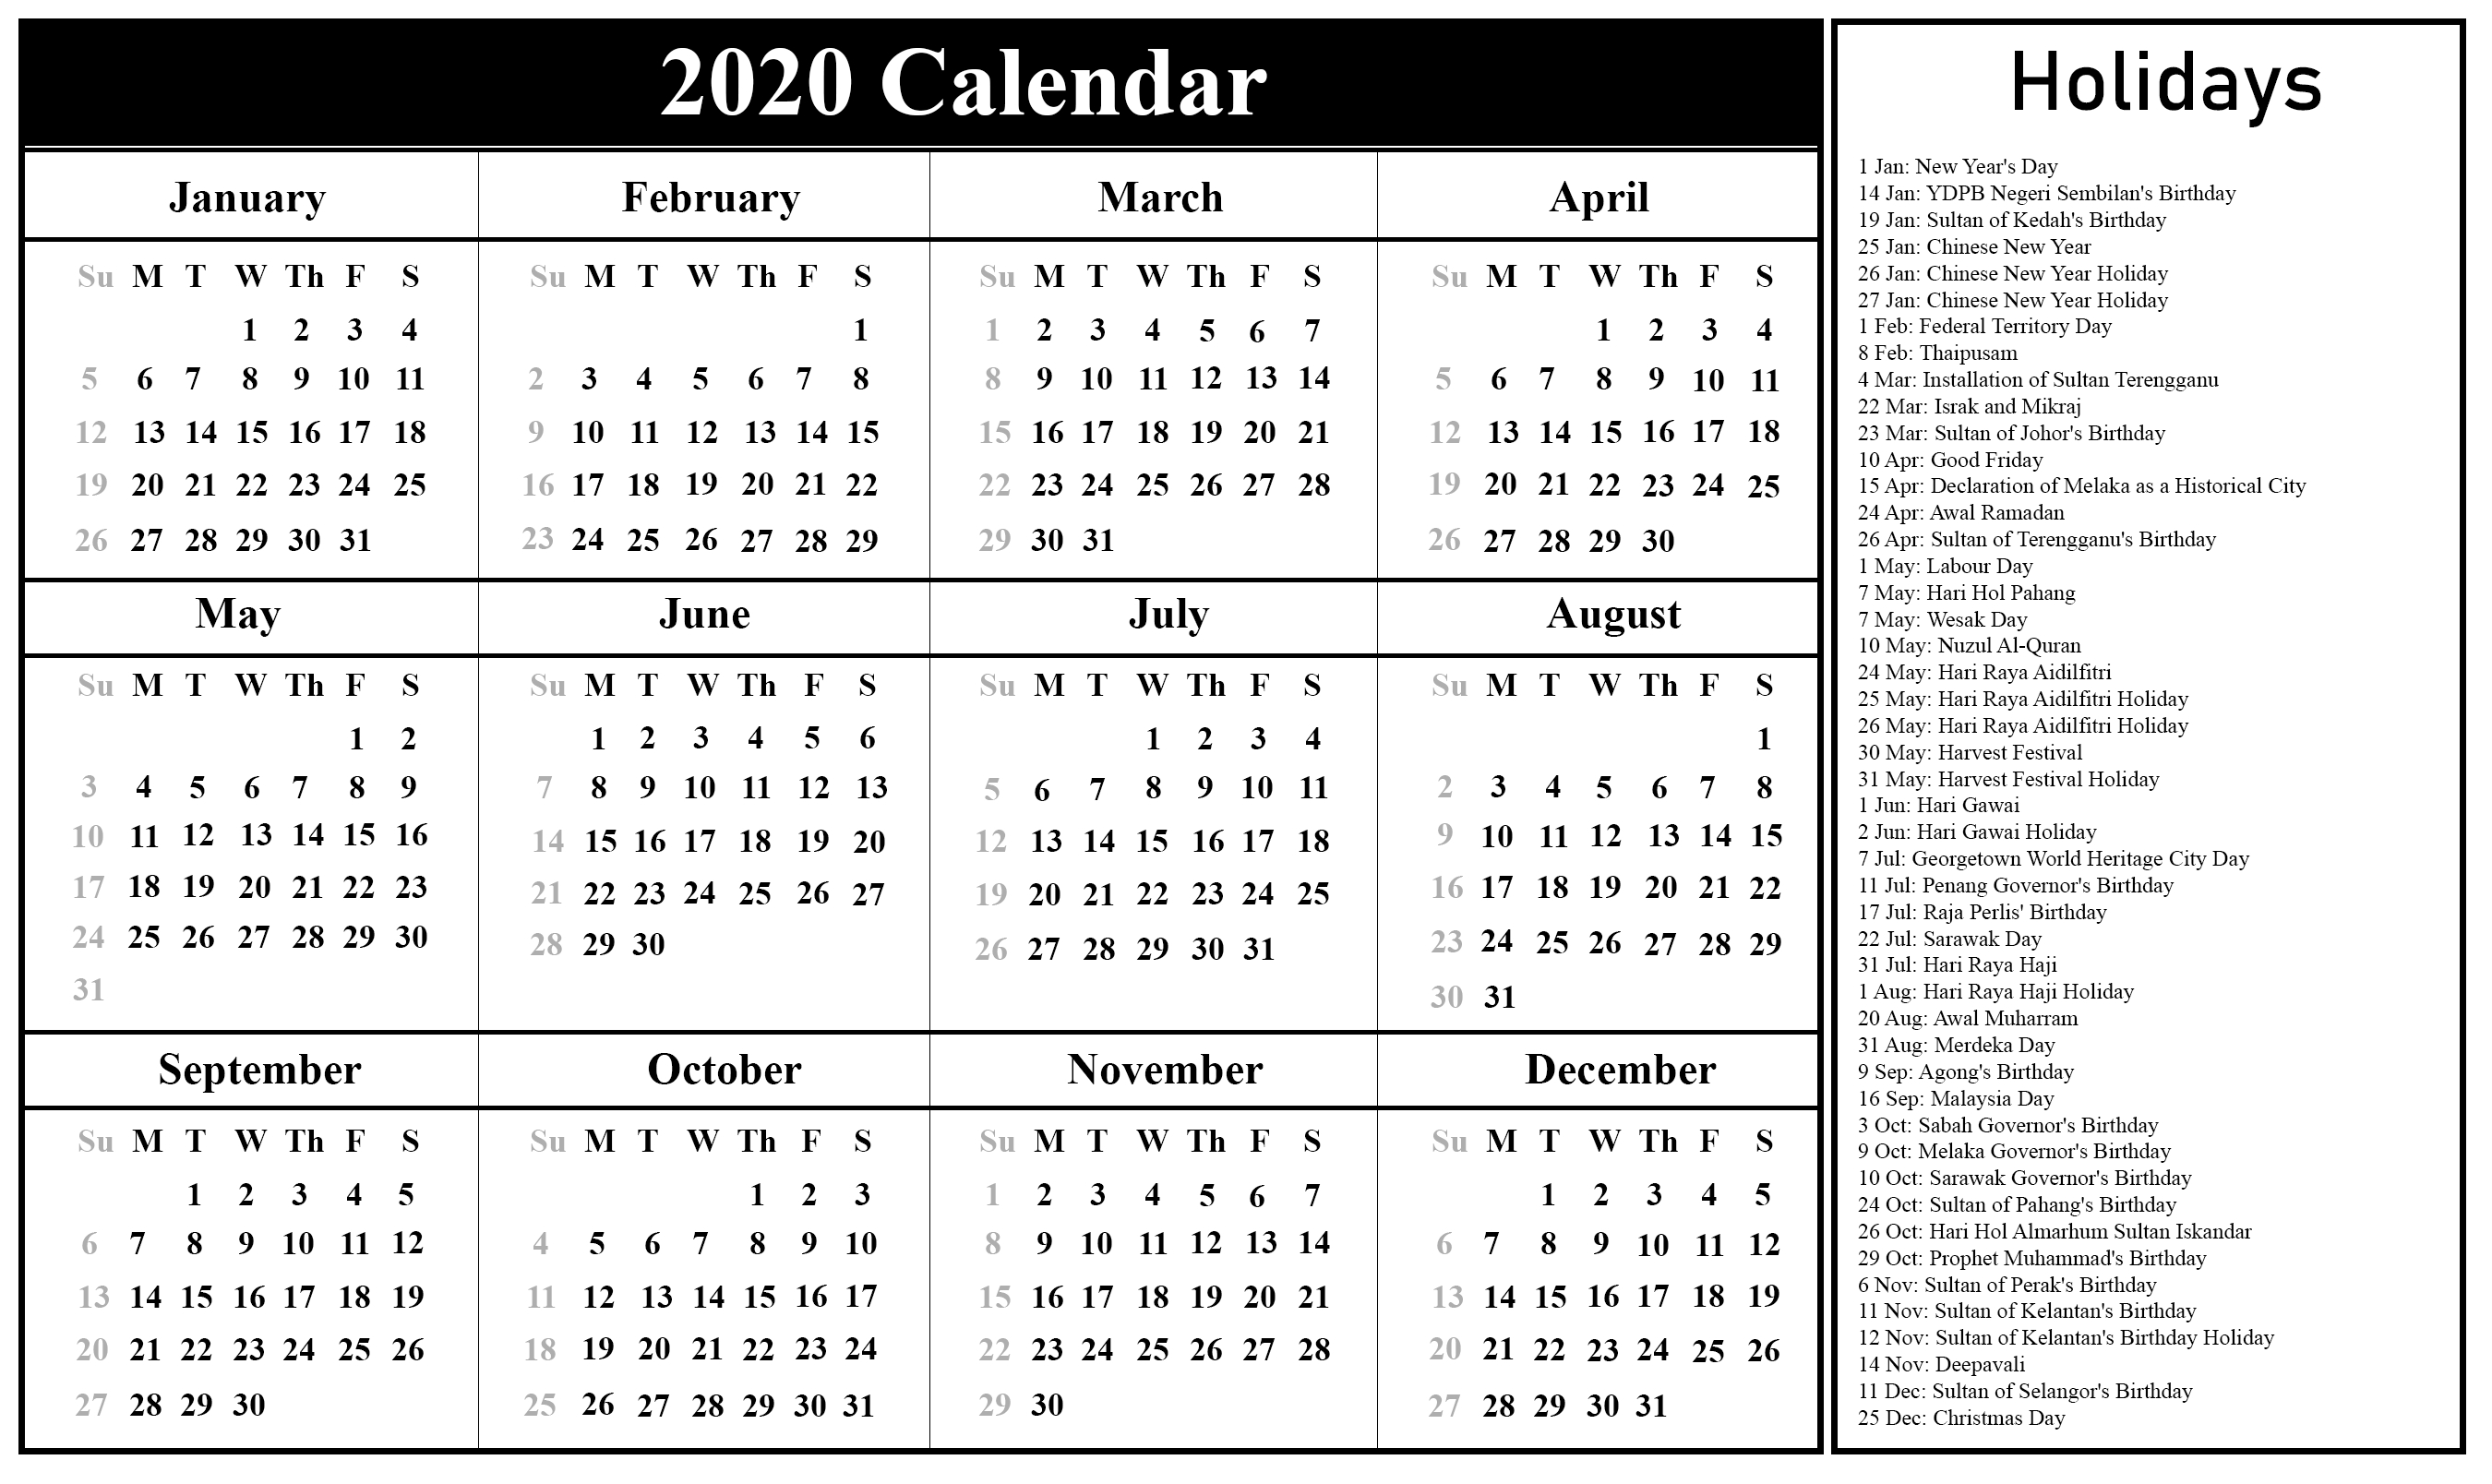 Free Blank Malaysia Calendar 2020 In Pdf, Excel & Word